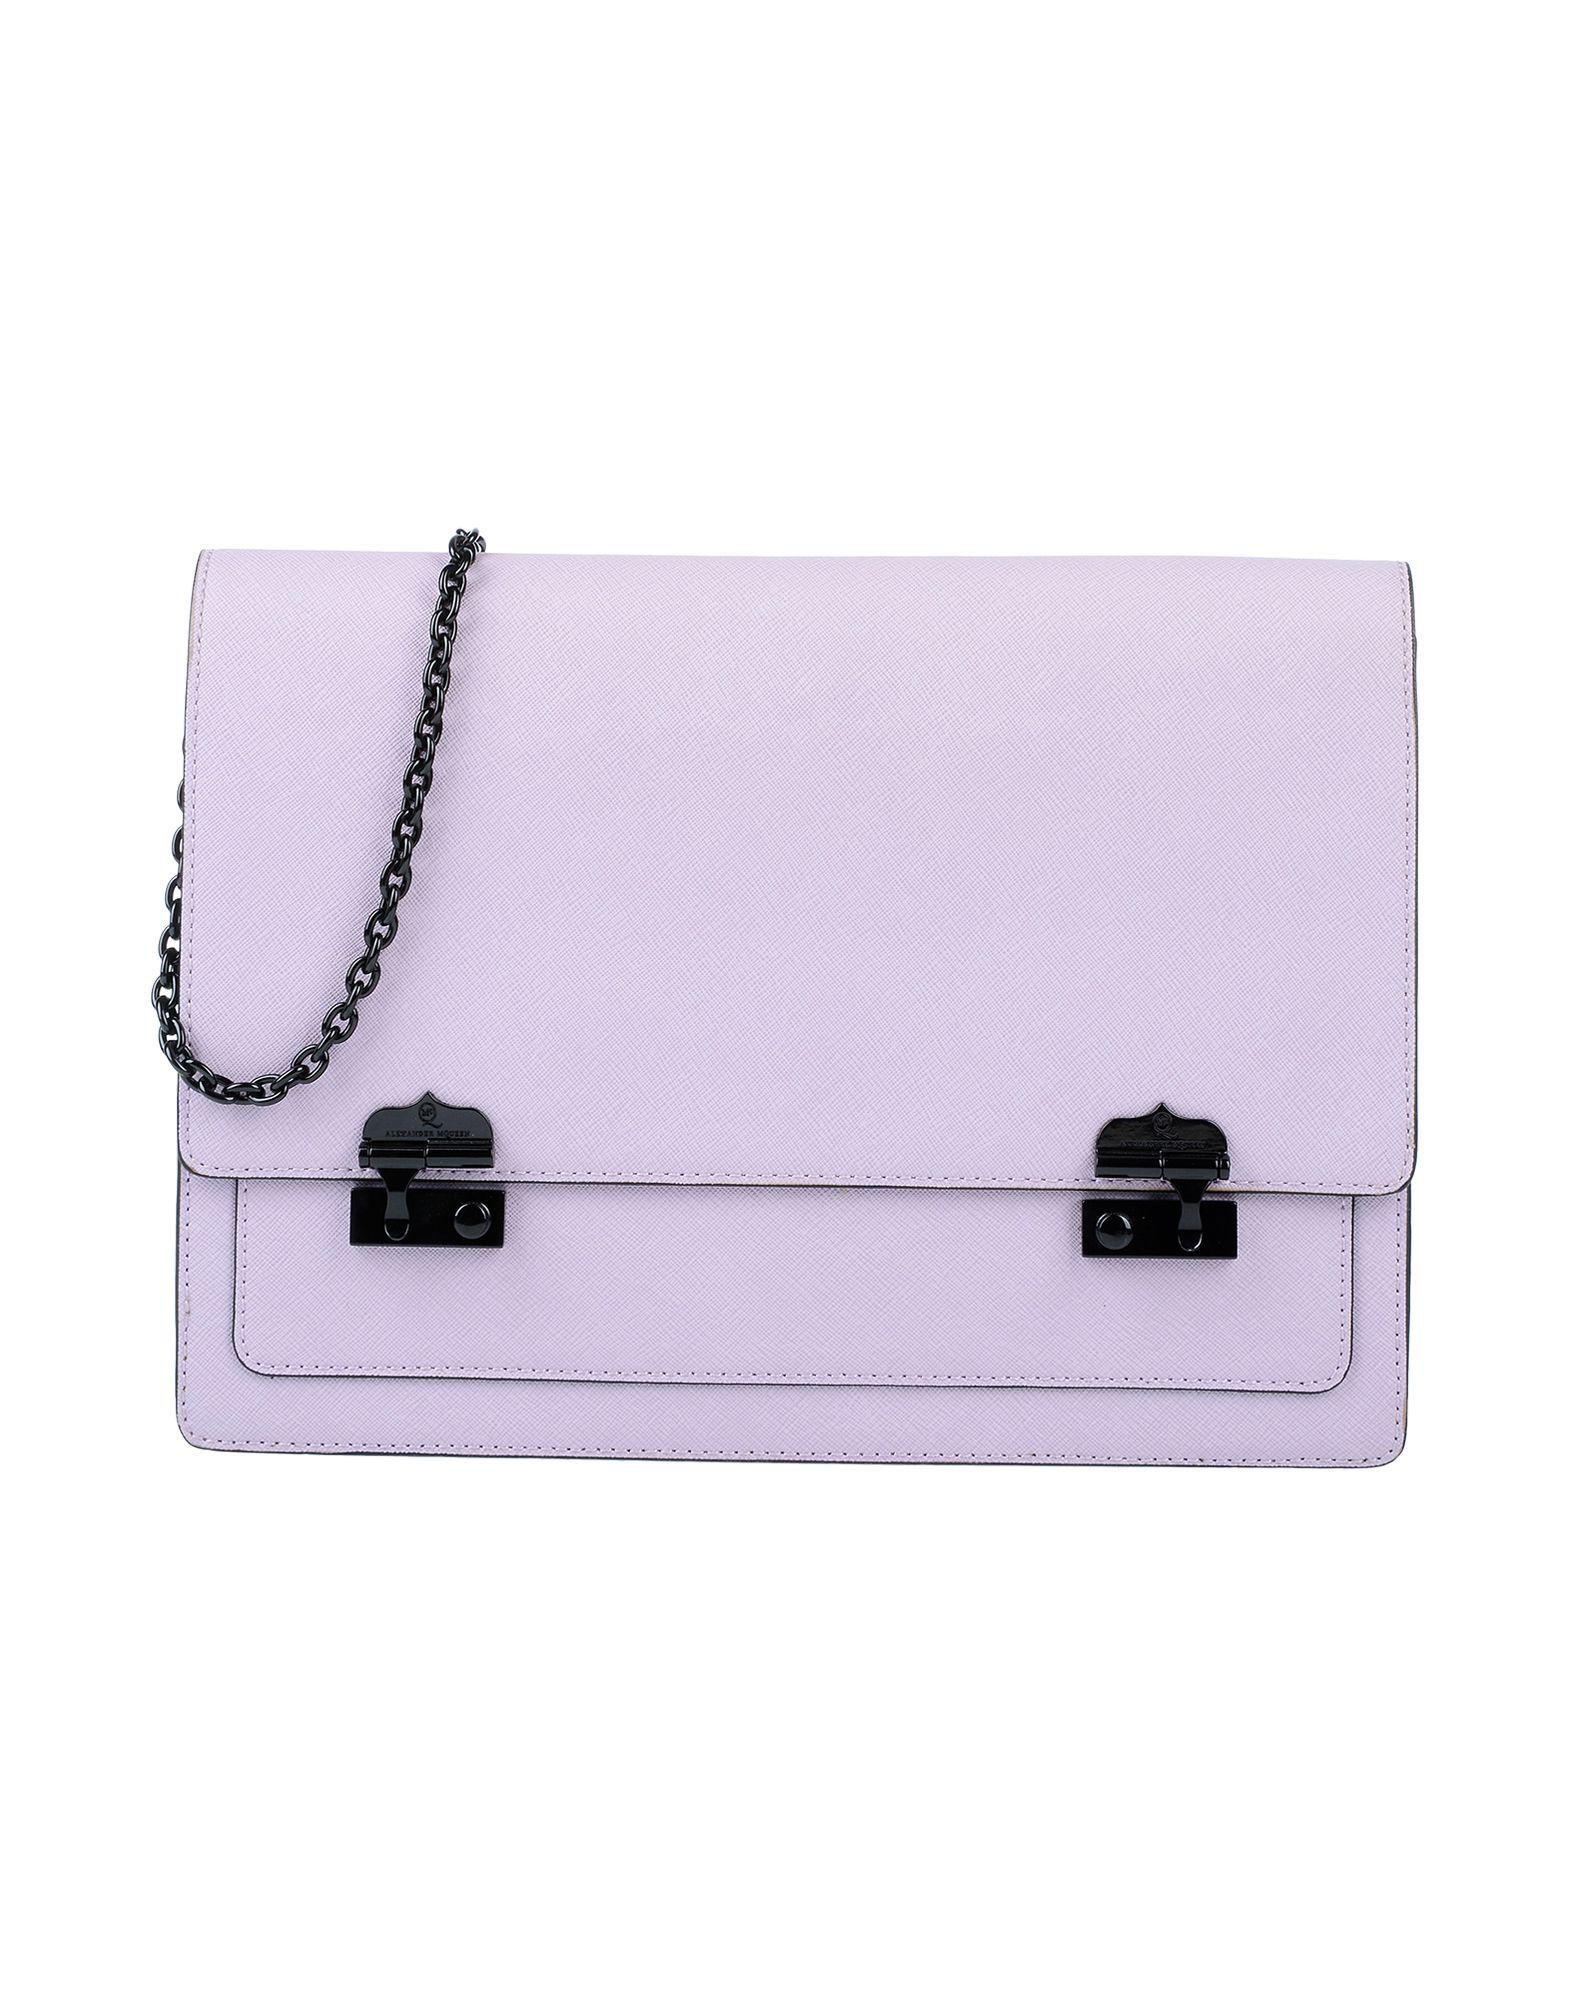 Mcq By Alexander Mcqueen Handbags In Lilac | ModeSens